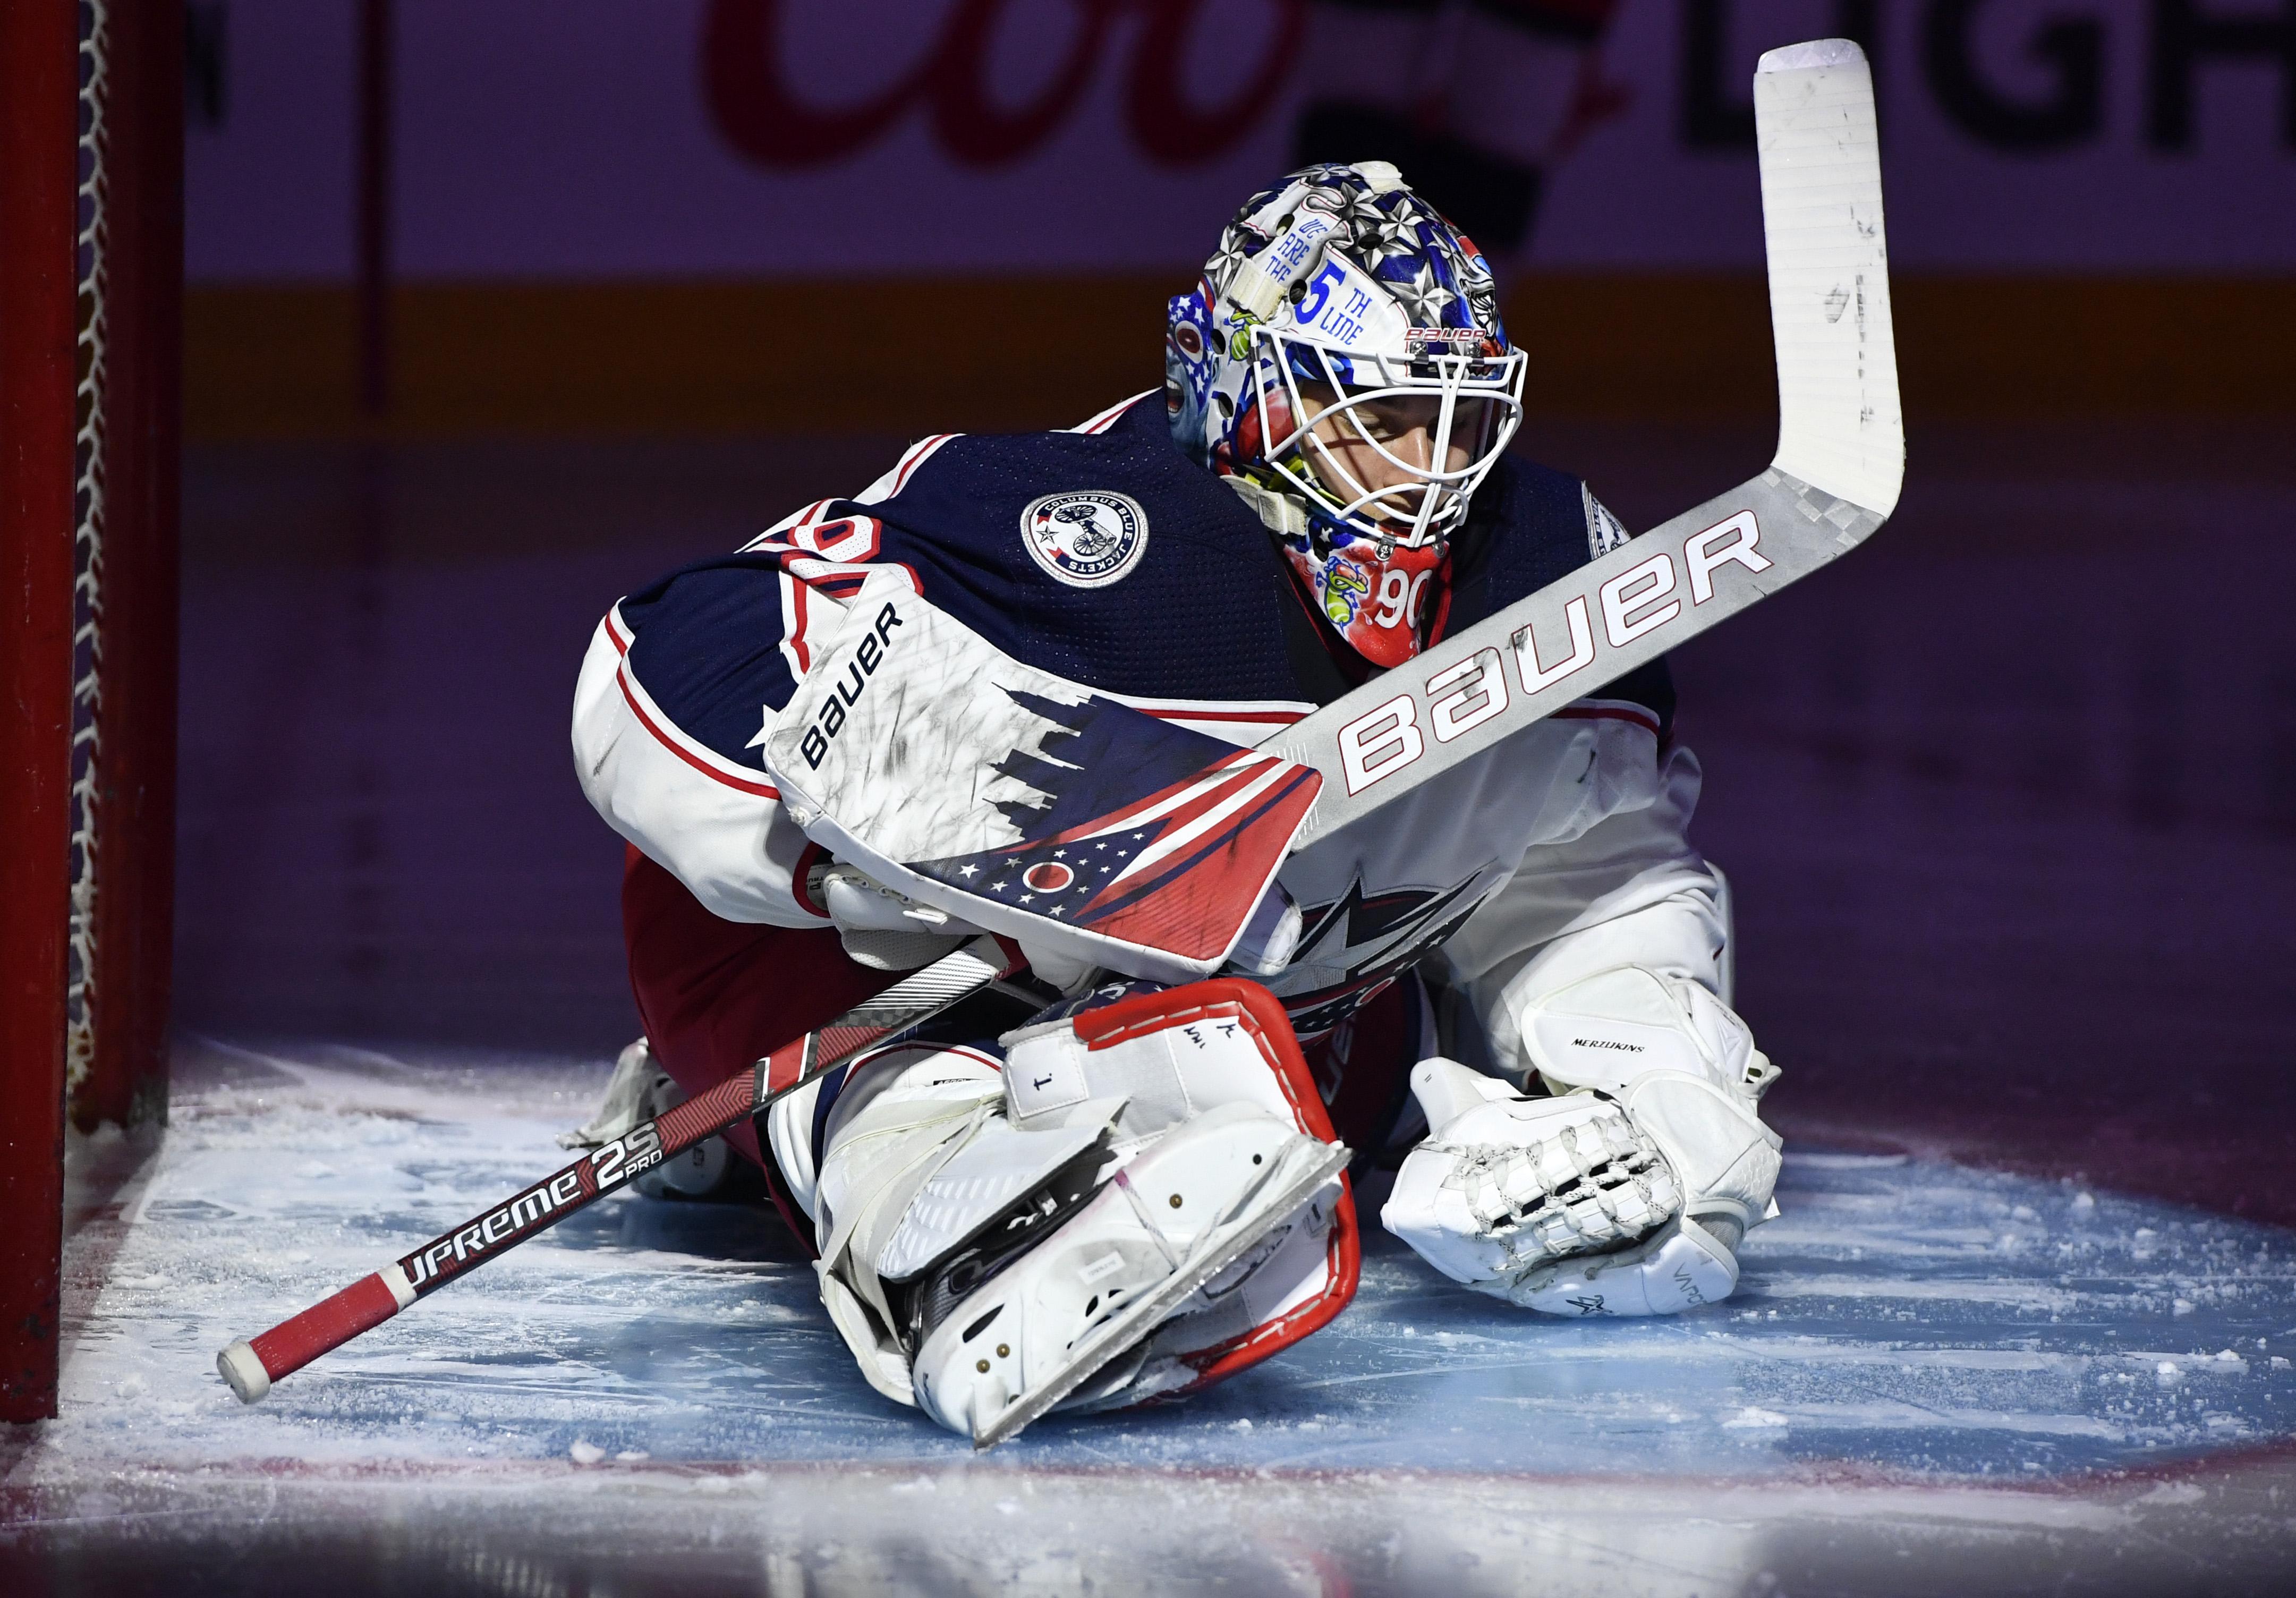 Blue Jackets goaltender Elvis Merzlikins records sixth NHL career shutout